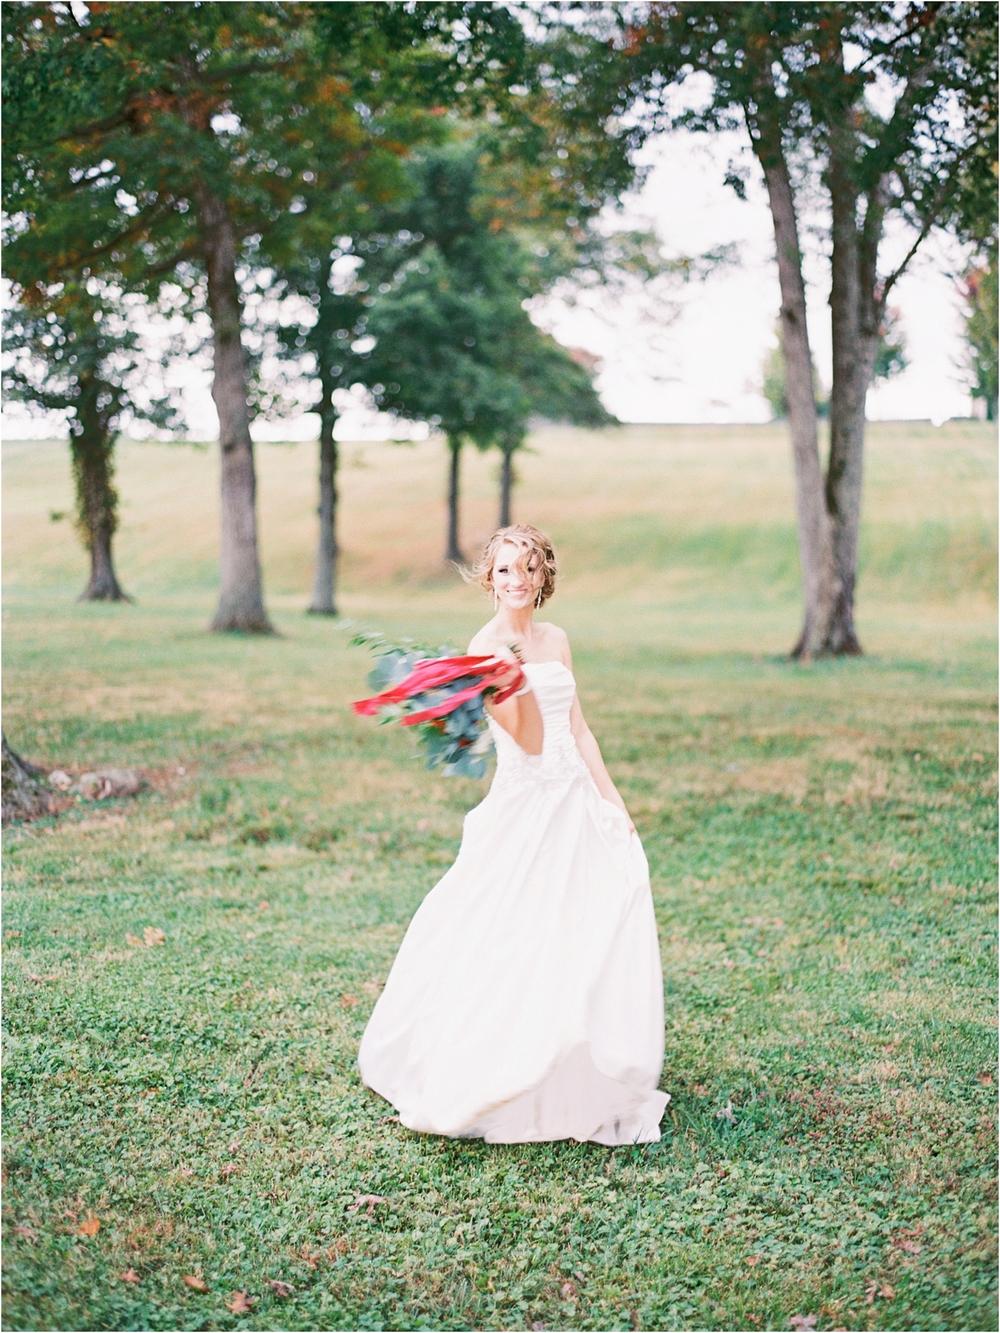 Springfield MO Wedding Ideas - Jordan Brittley Photography (www.jordanbrittley.com)